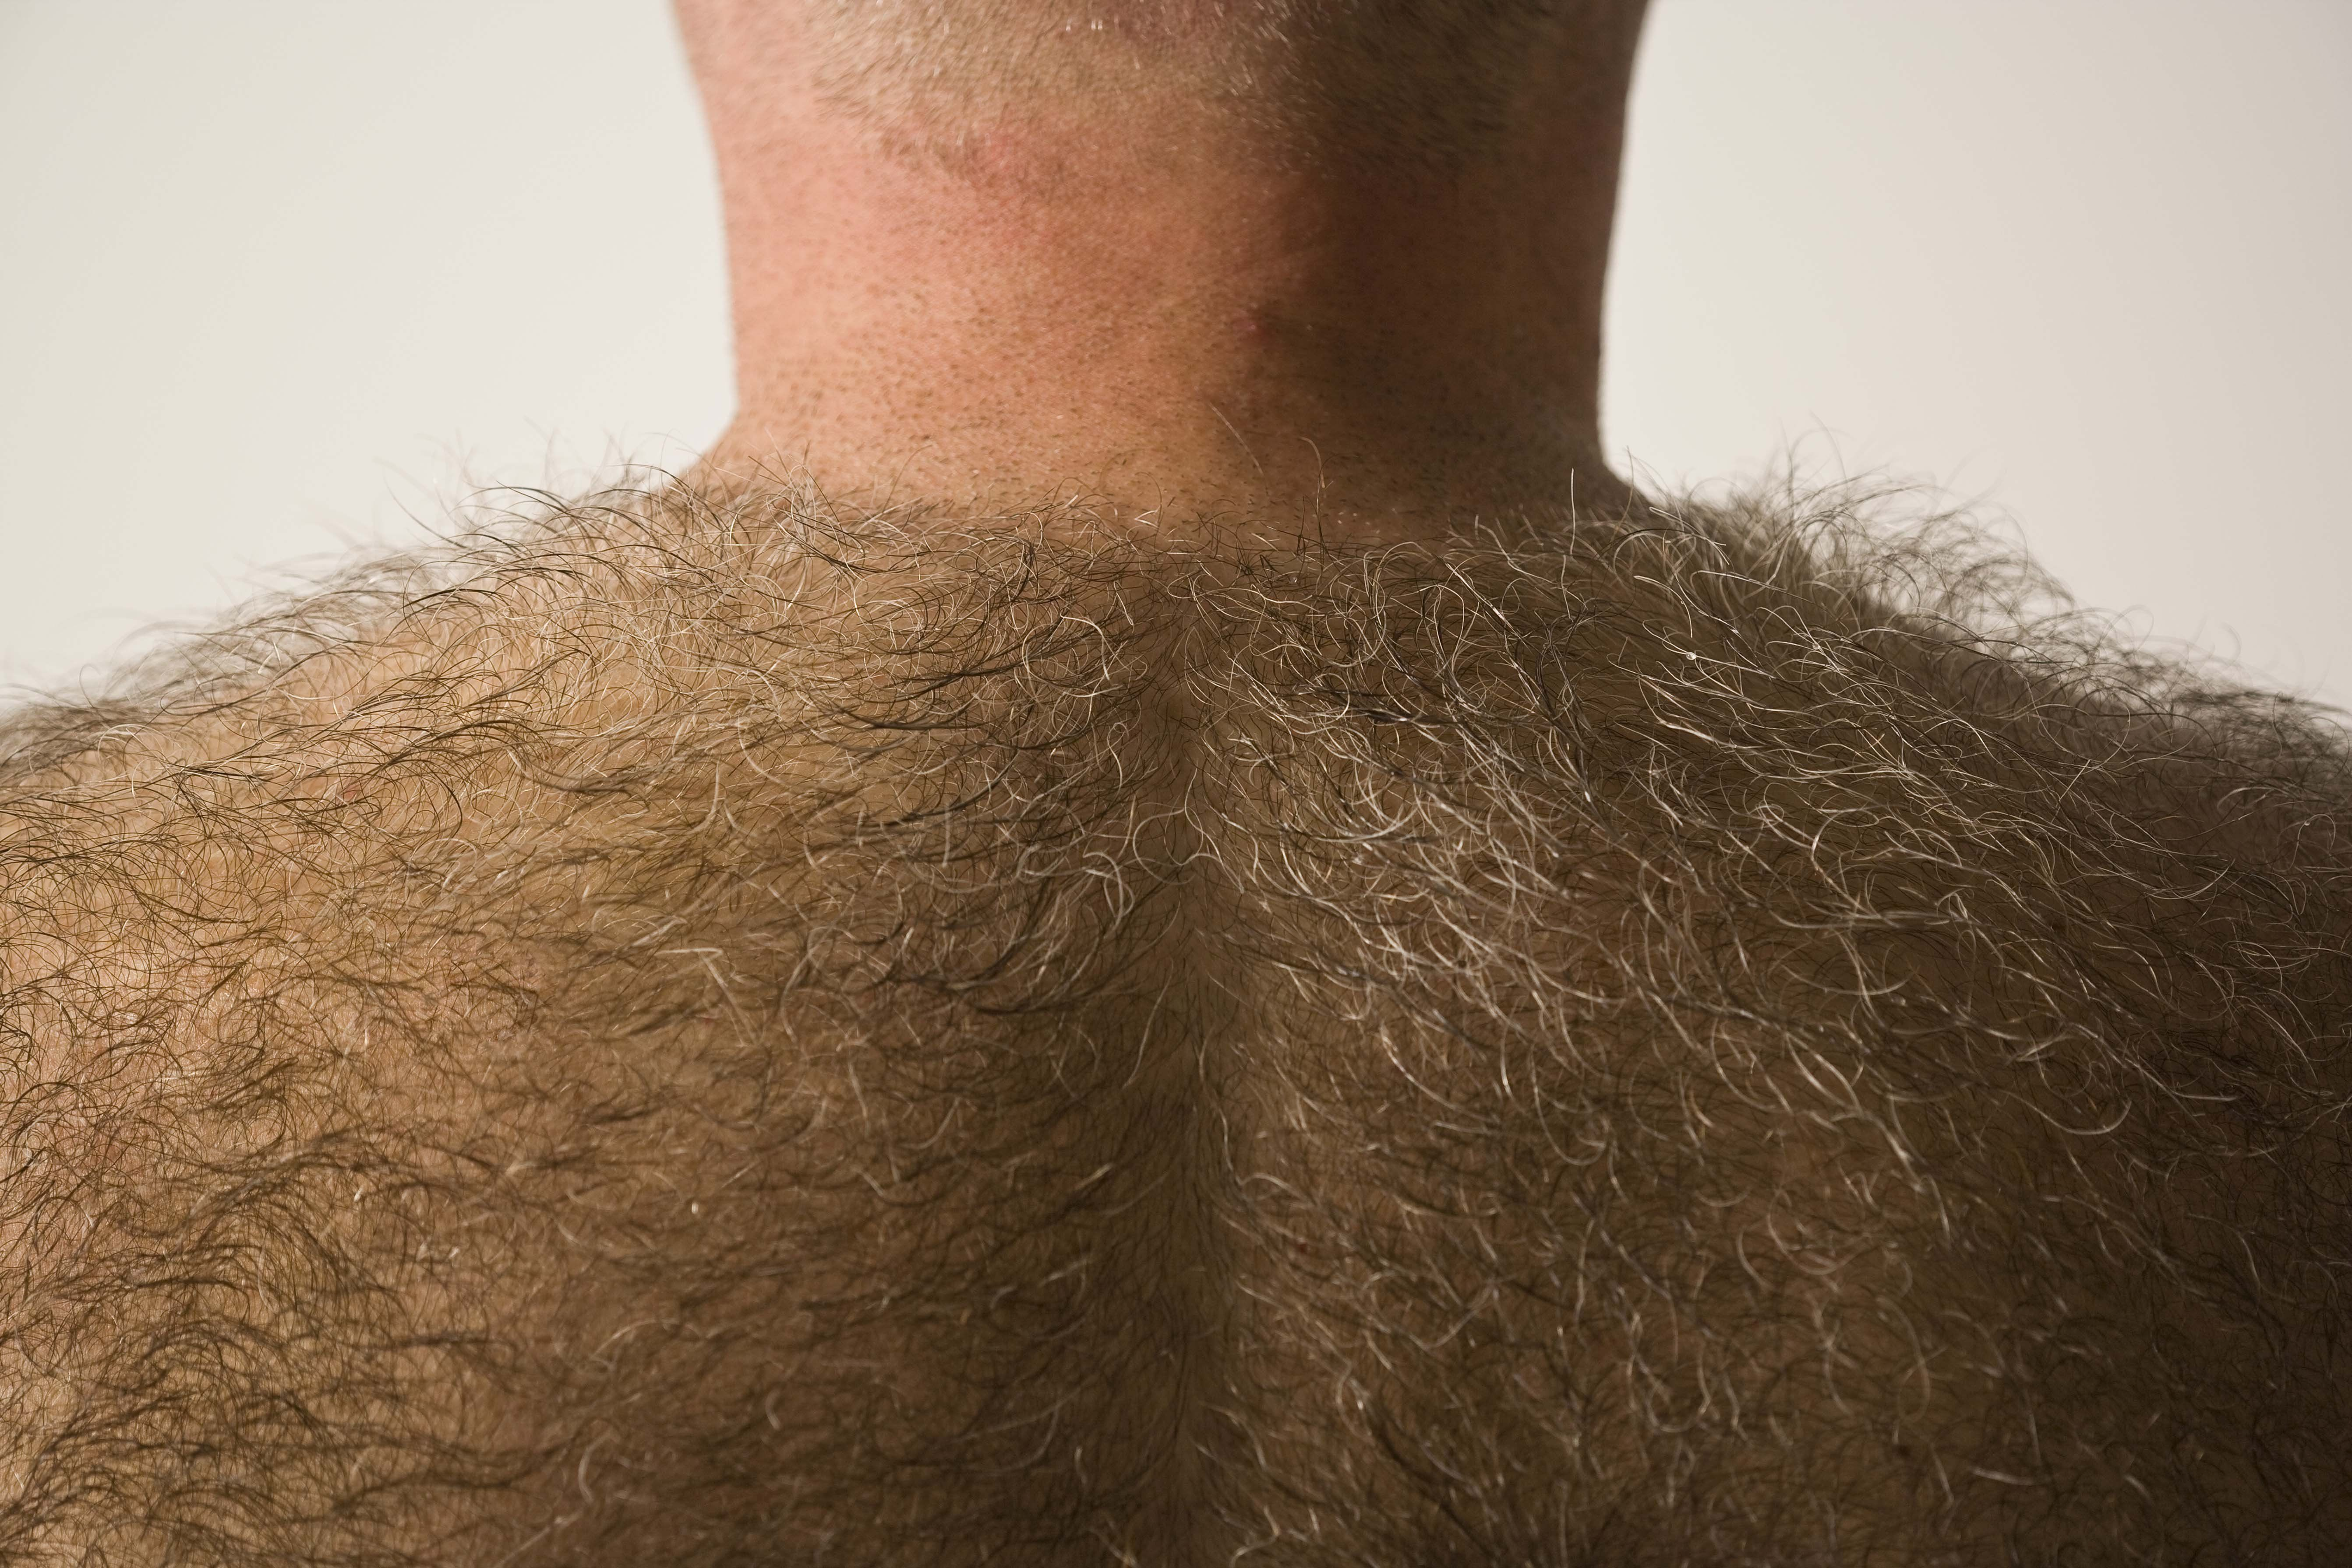 Does pubic hair go grey